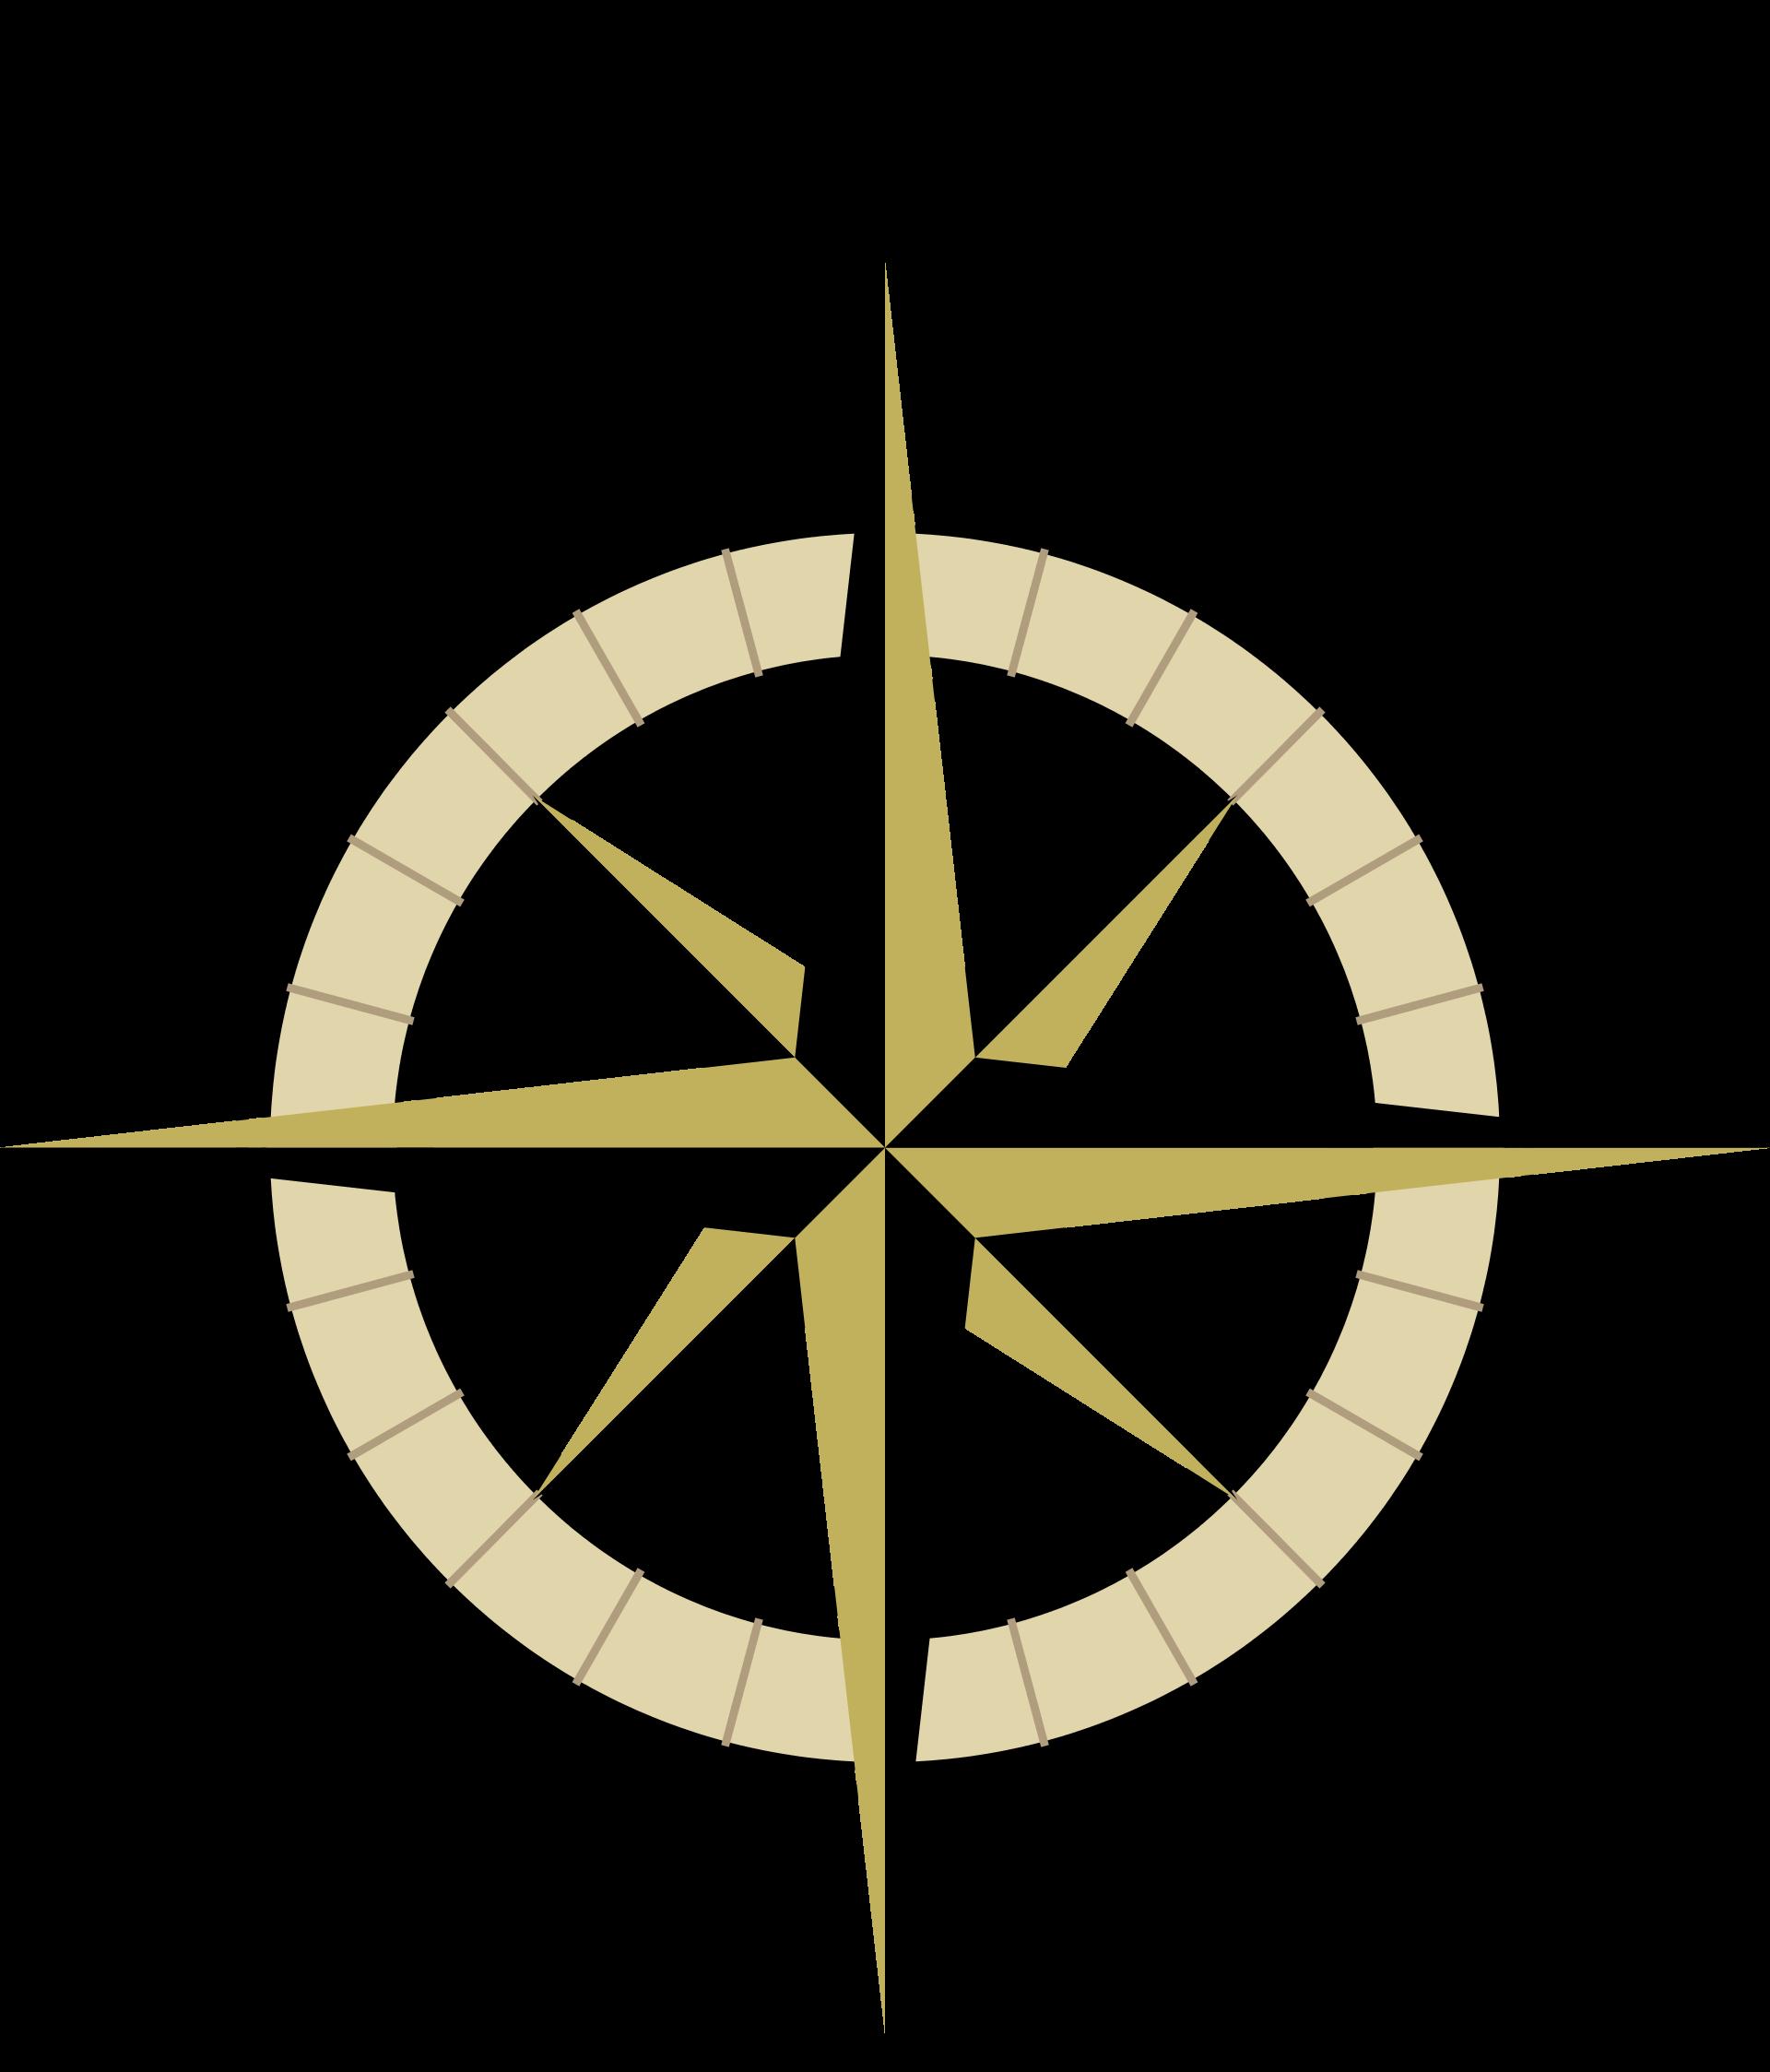 Clipart Compass Rose - ClipArt Best